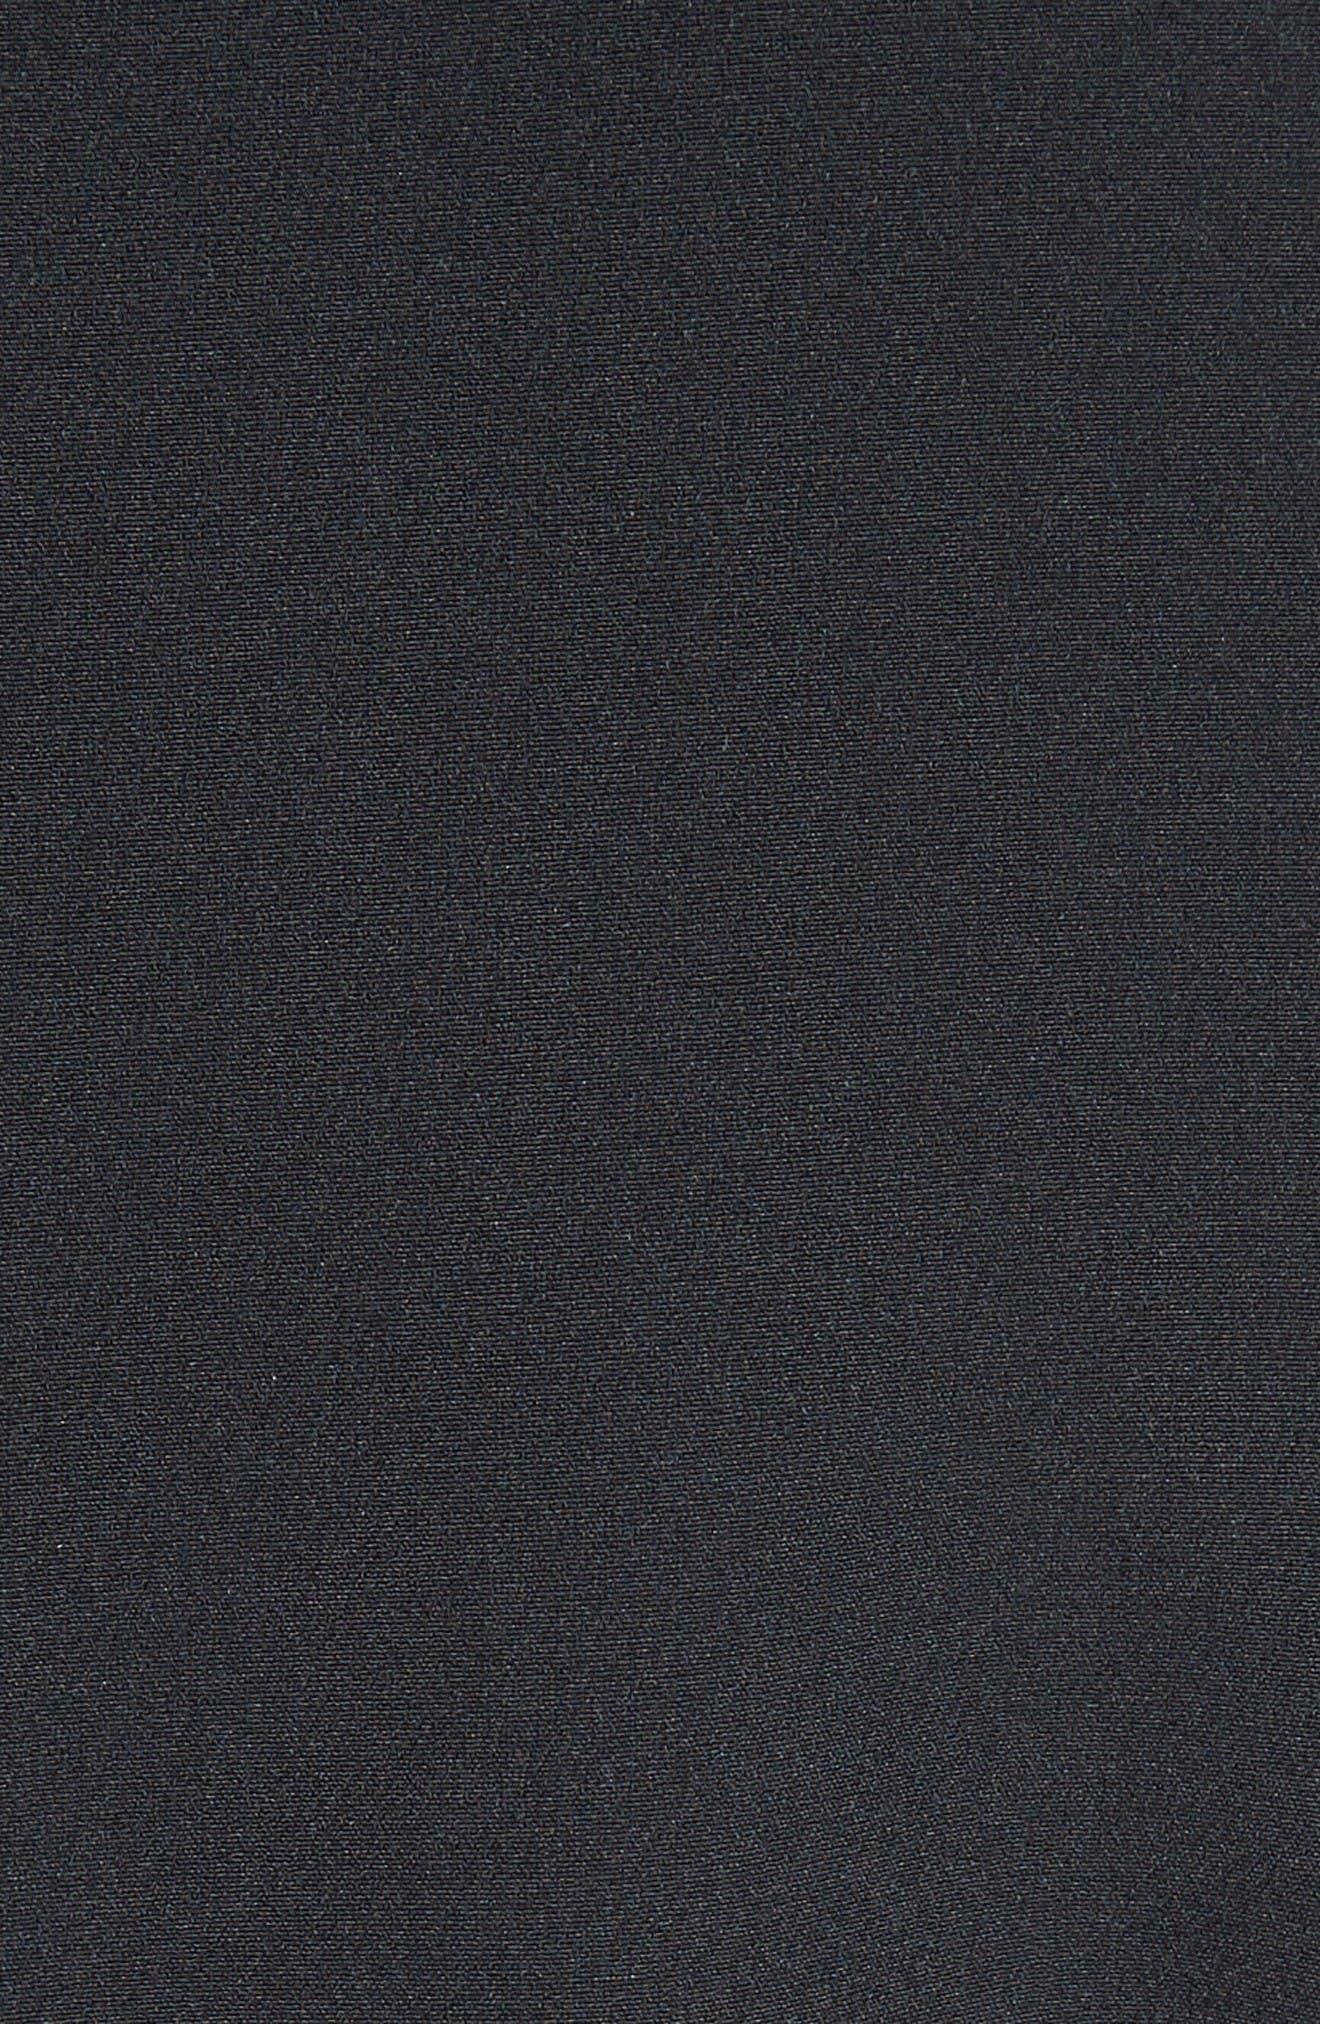 Stretch Crepe Cold Shoulder Minidress,                             Alternate thumbnail 5, color,                             Black